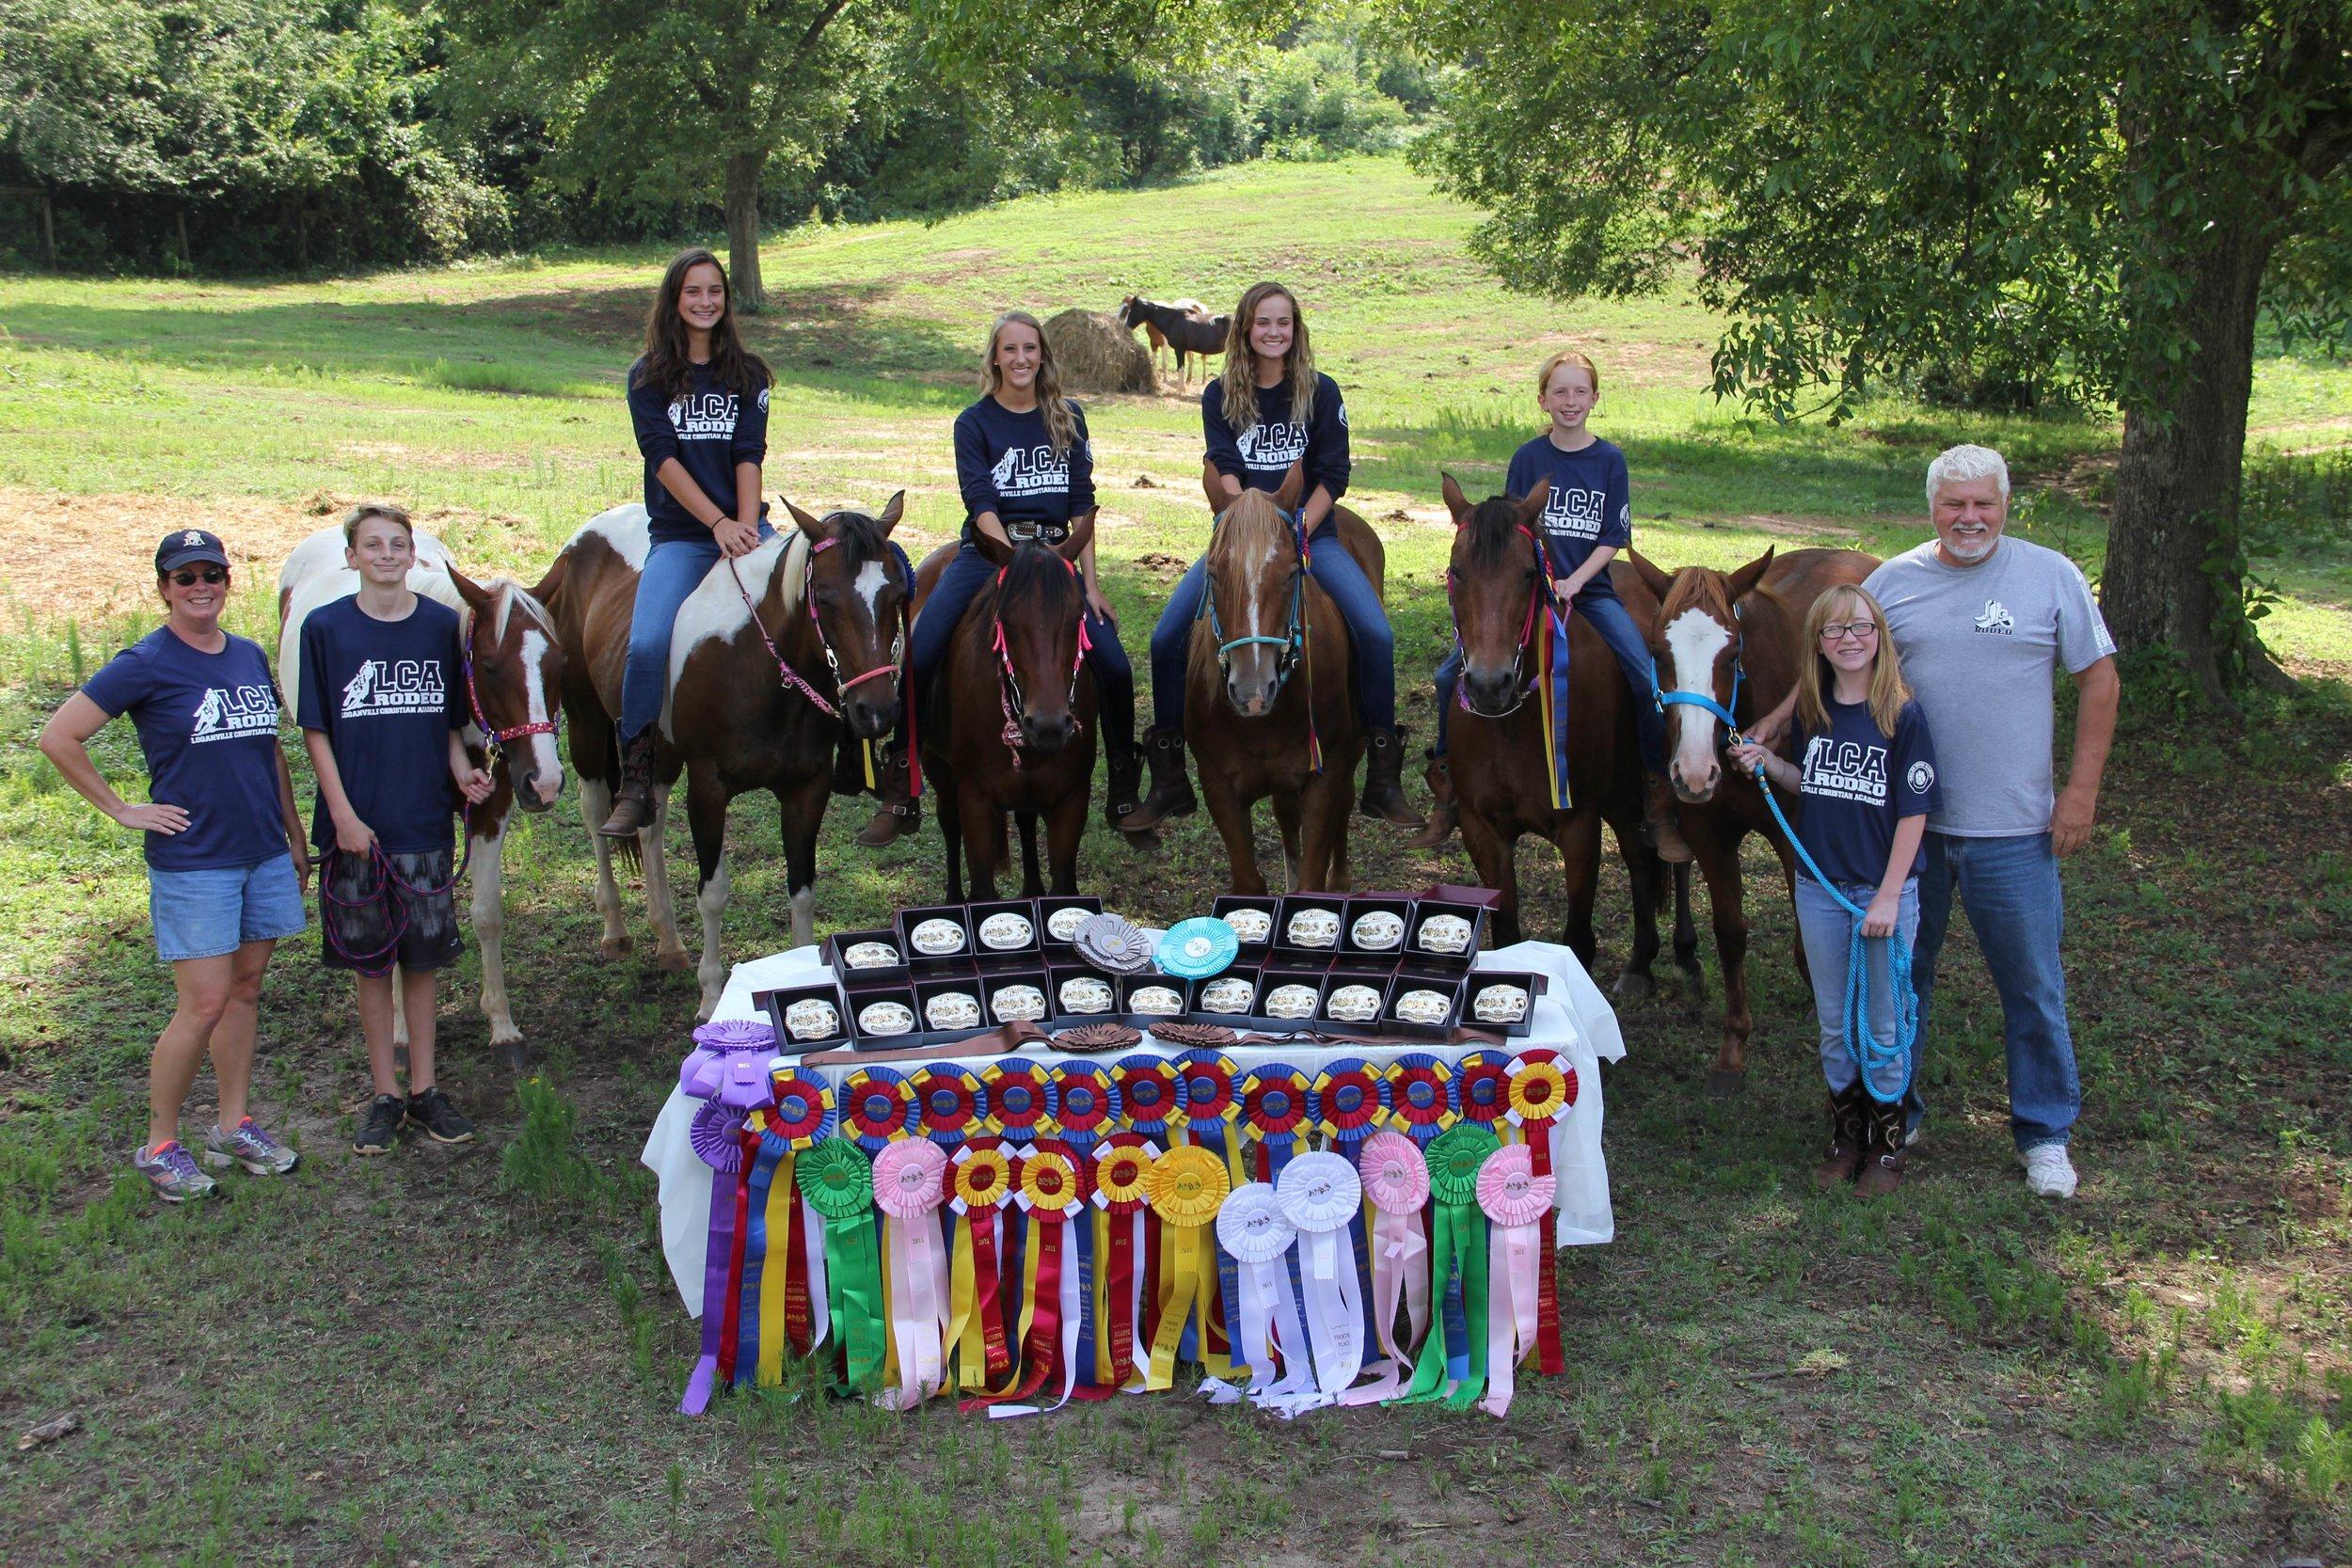 2015 Rodeo World Champions